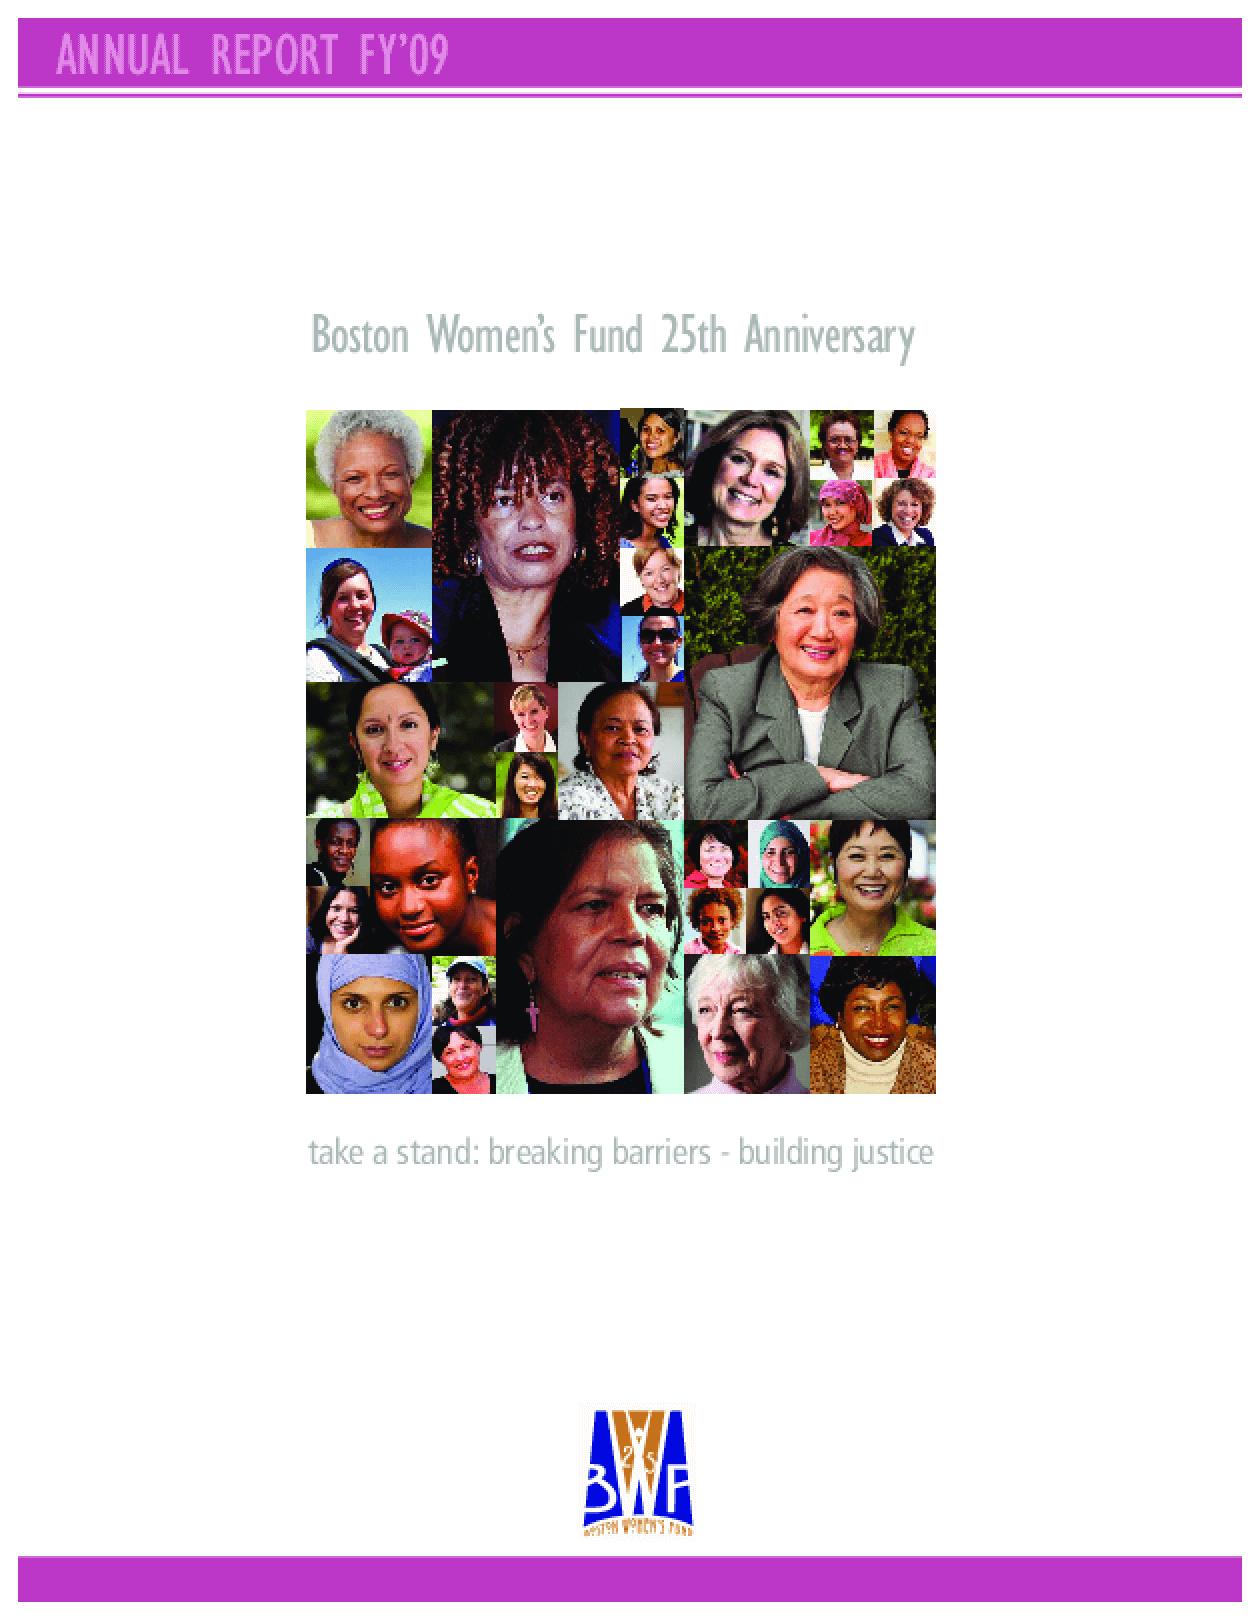 Boston Women's Fund Annual Report FY 09